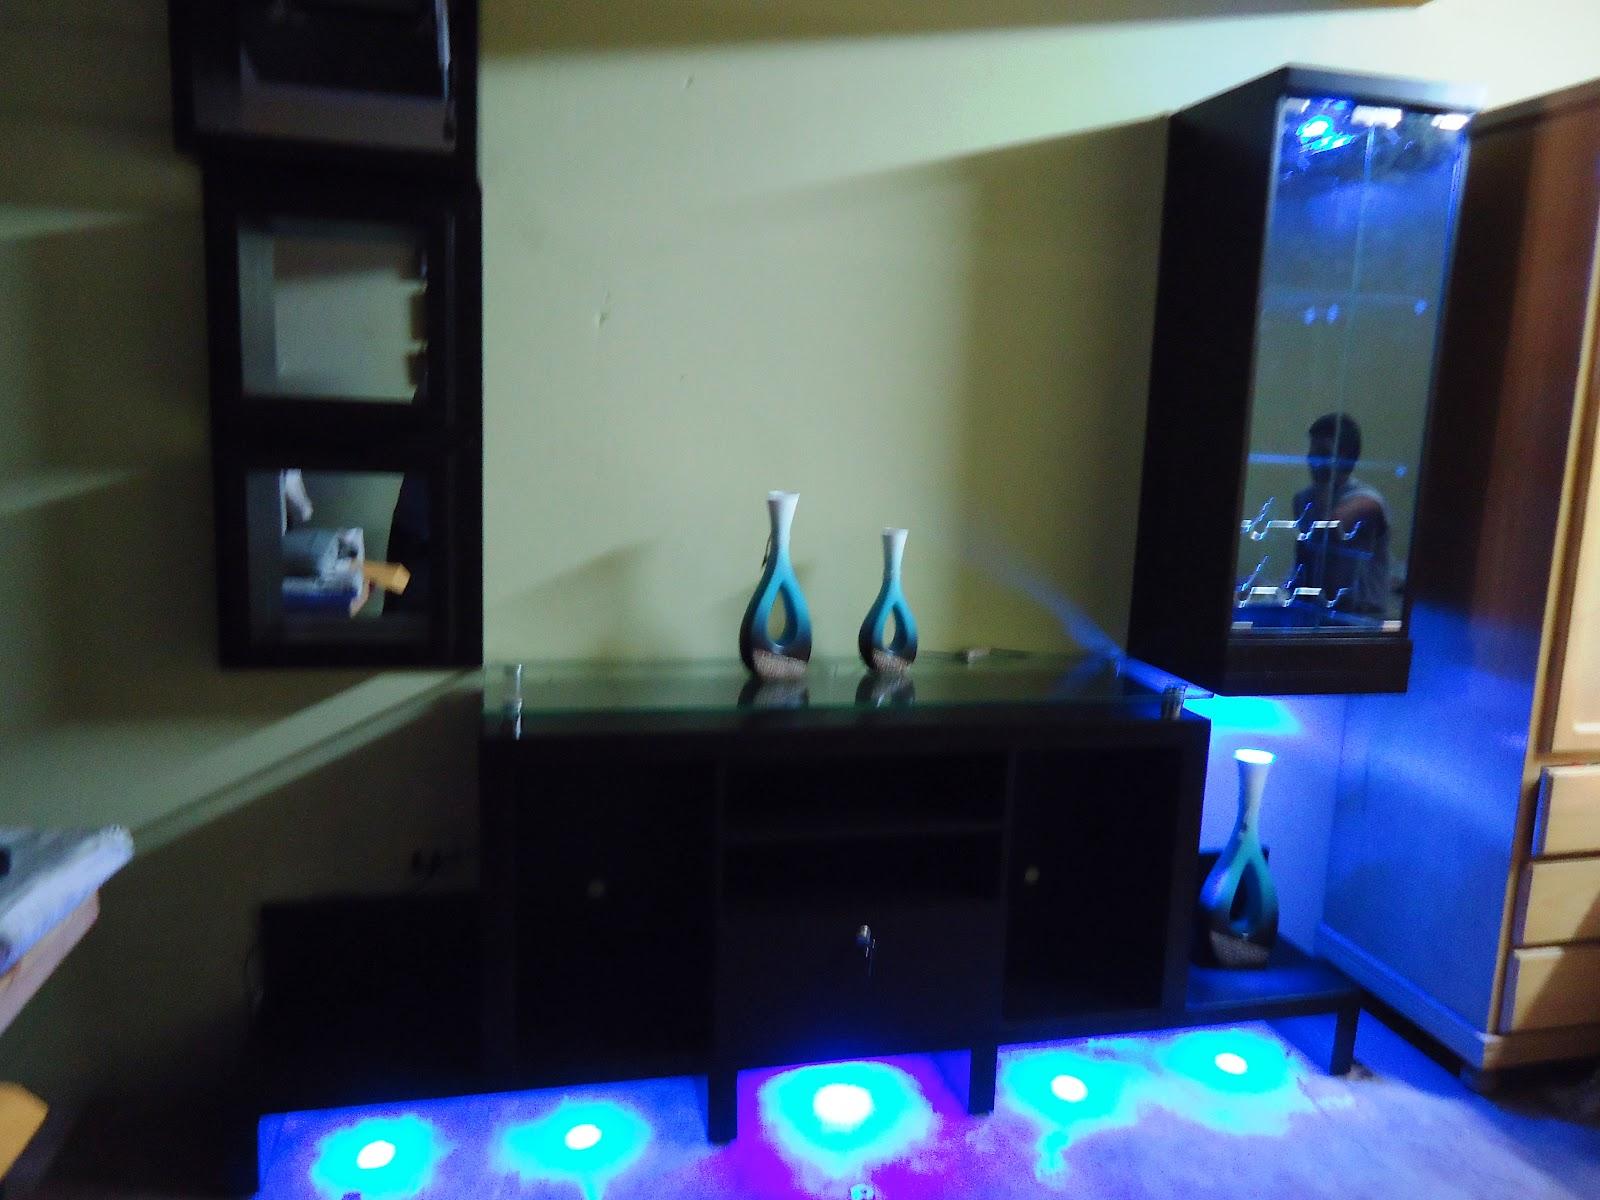 Mueble bar flotante 20170906104408 for Modelos de muebles para bar